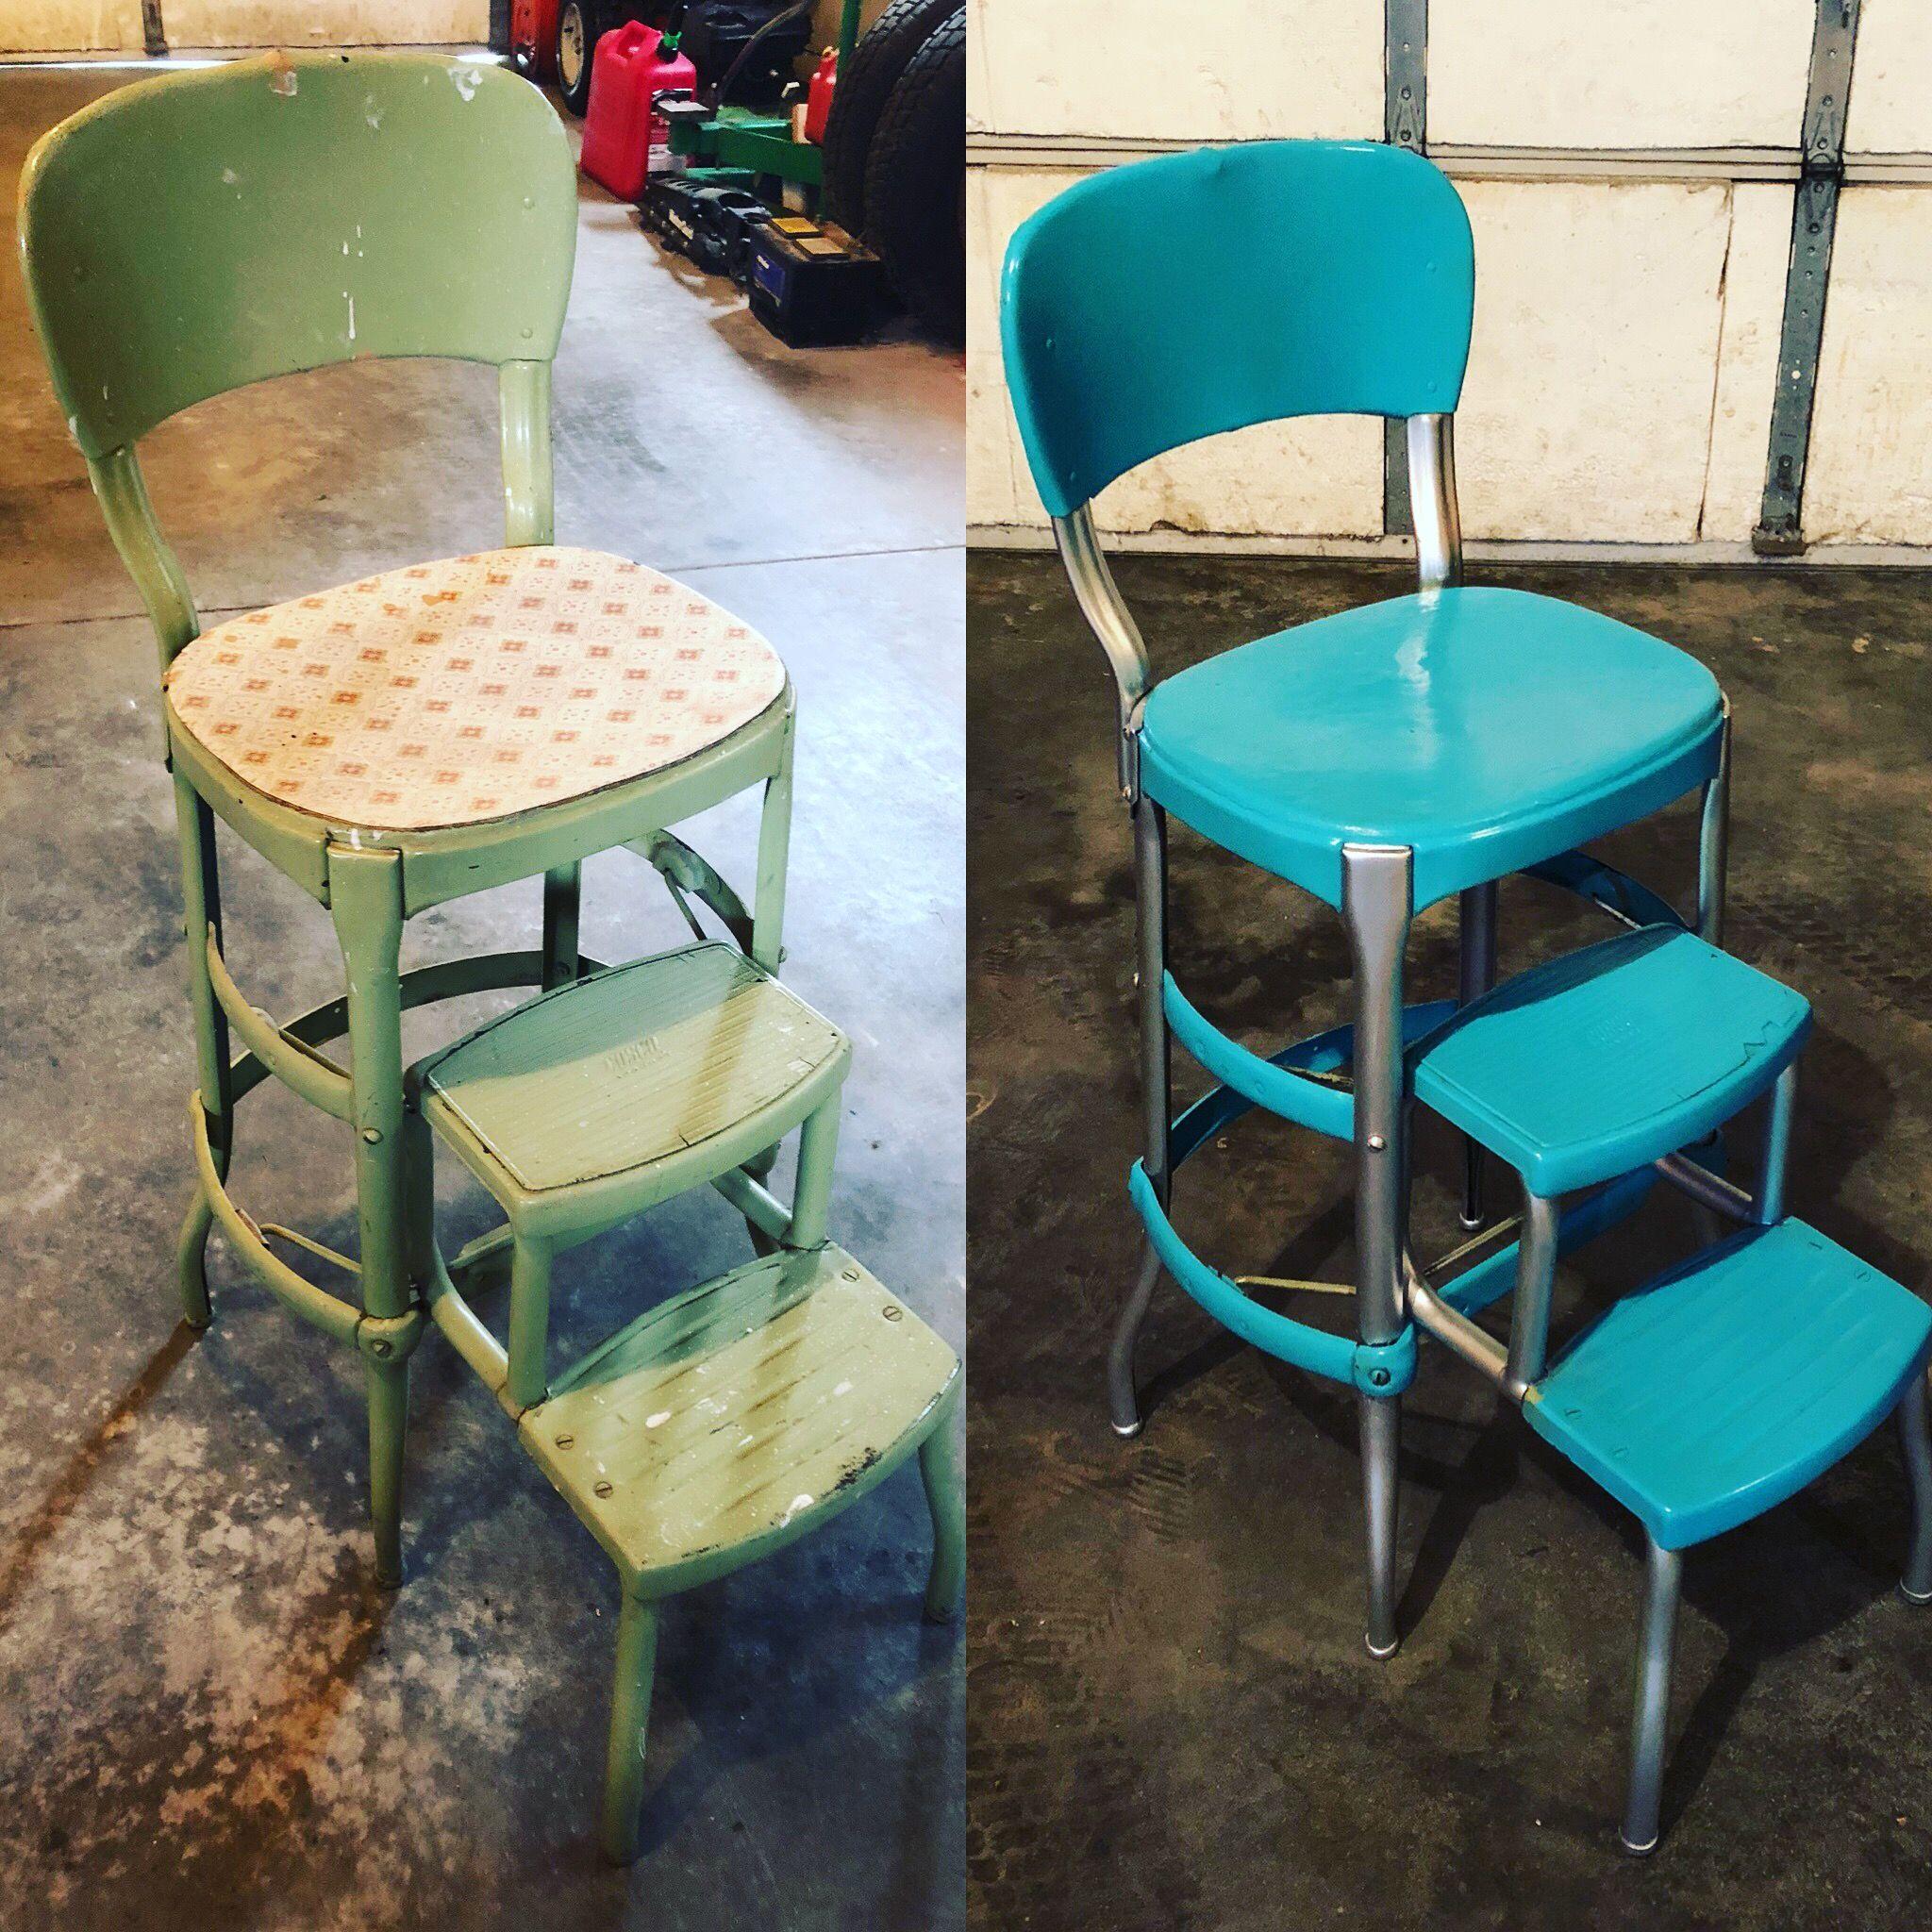 Brilliant Cosco Step Stool Make Over Home Projects In 2019 Inzonedesignstudio Interior Chair Design Inzonedesignstudiocom